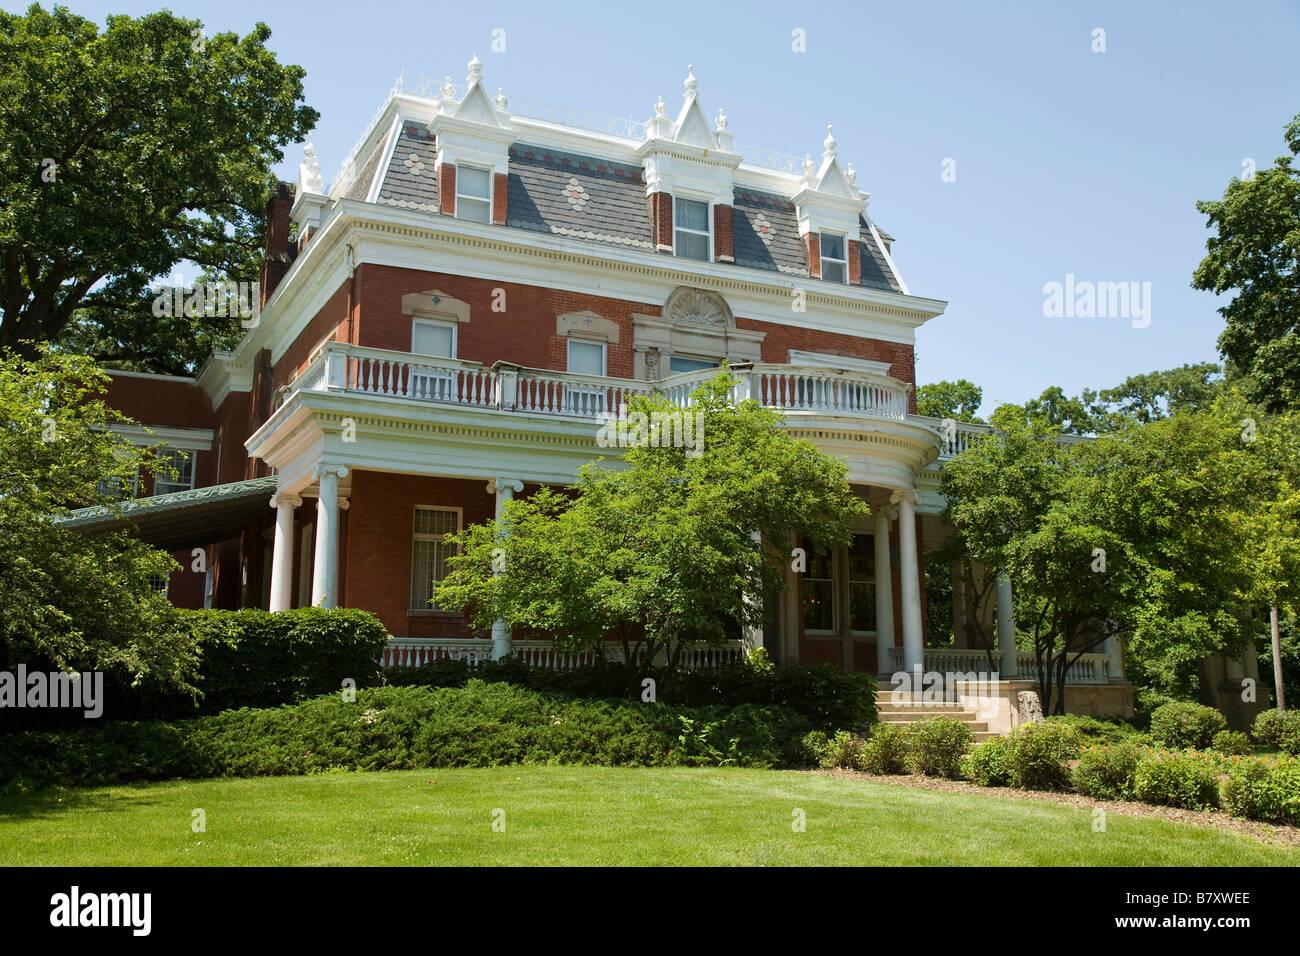 Fantastic Illinois Dekalb Exterior Of Ellwood House And Museum Built Download Free Architecture Designs Sospemadebymaigaardcom